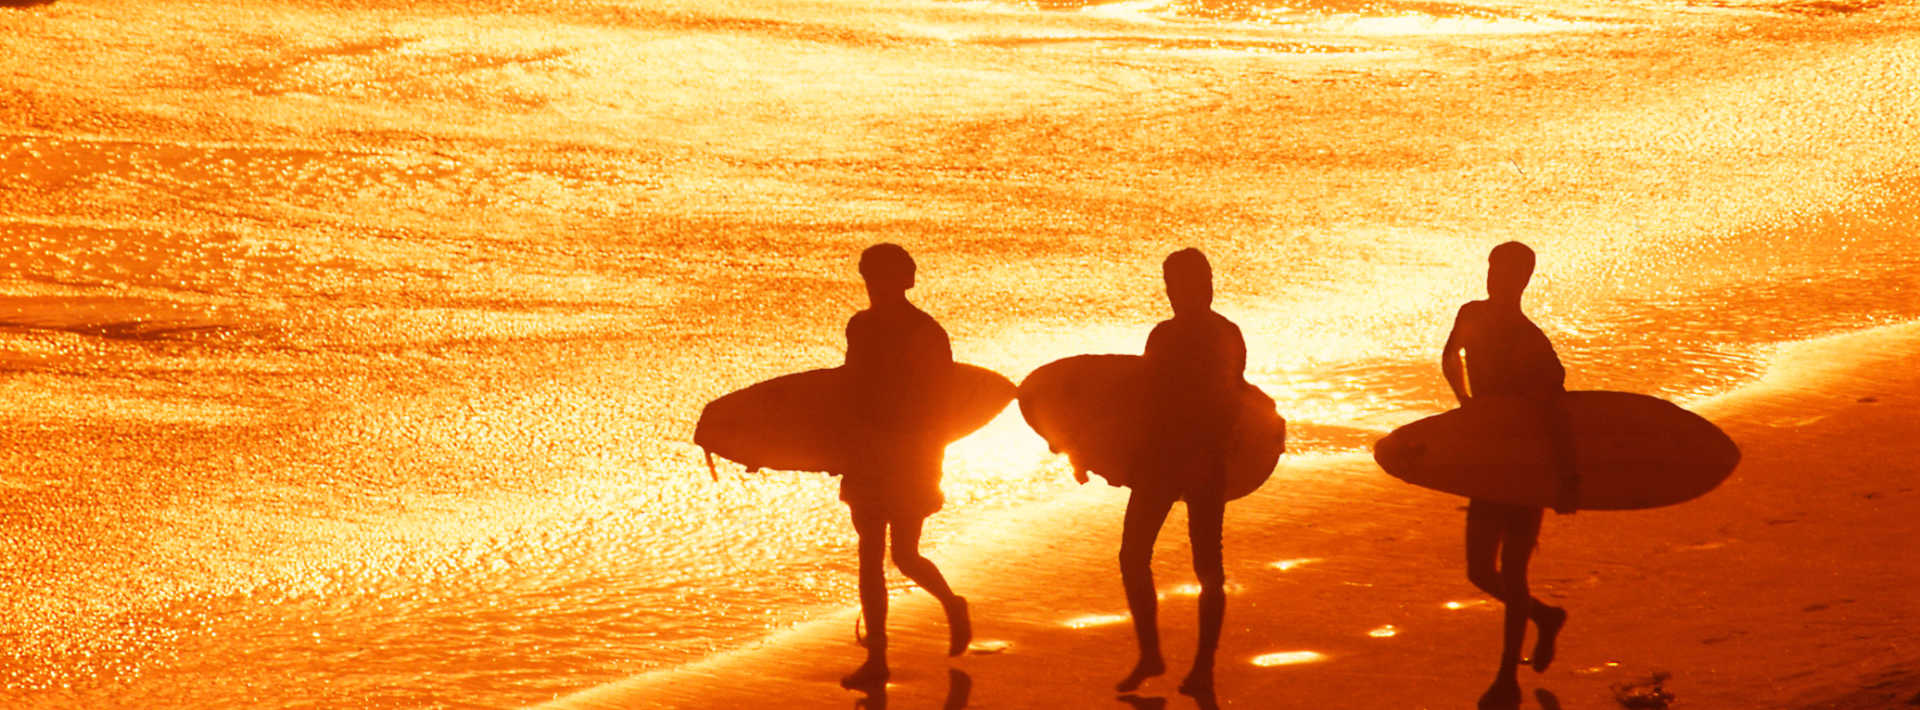 Galveston Beach Surfers